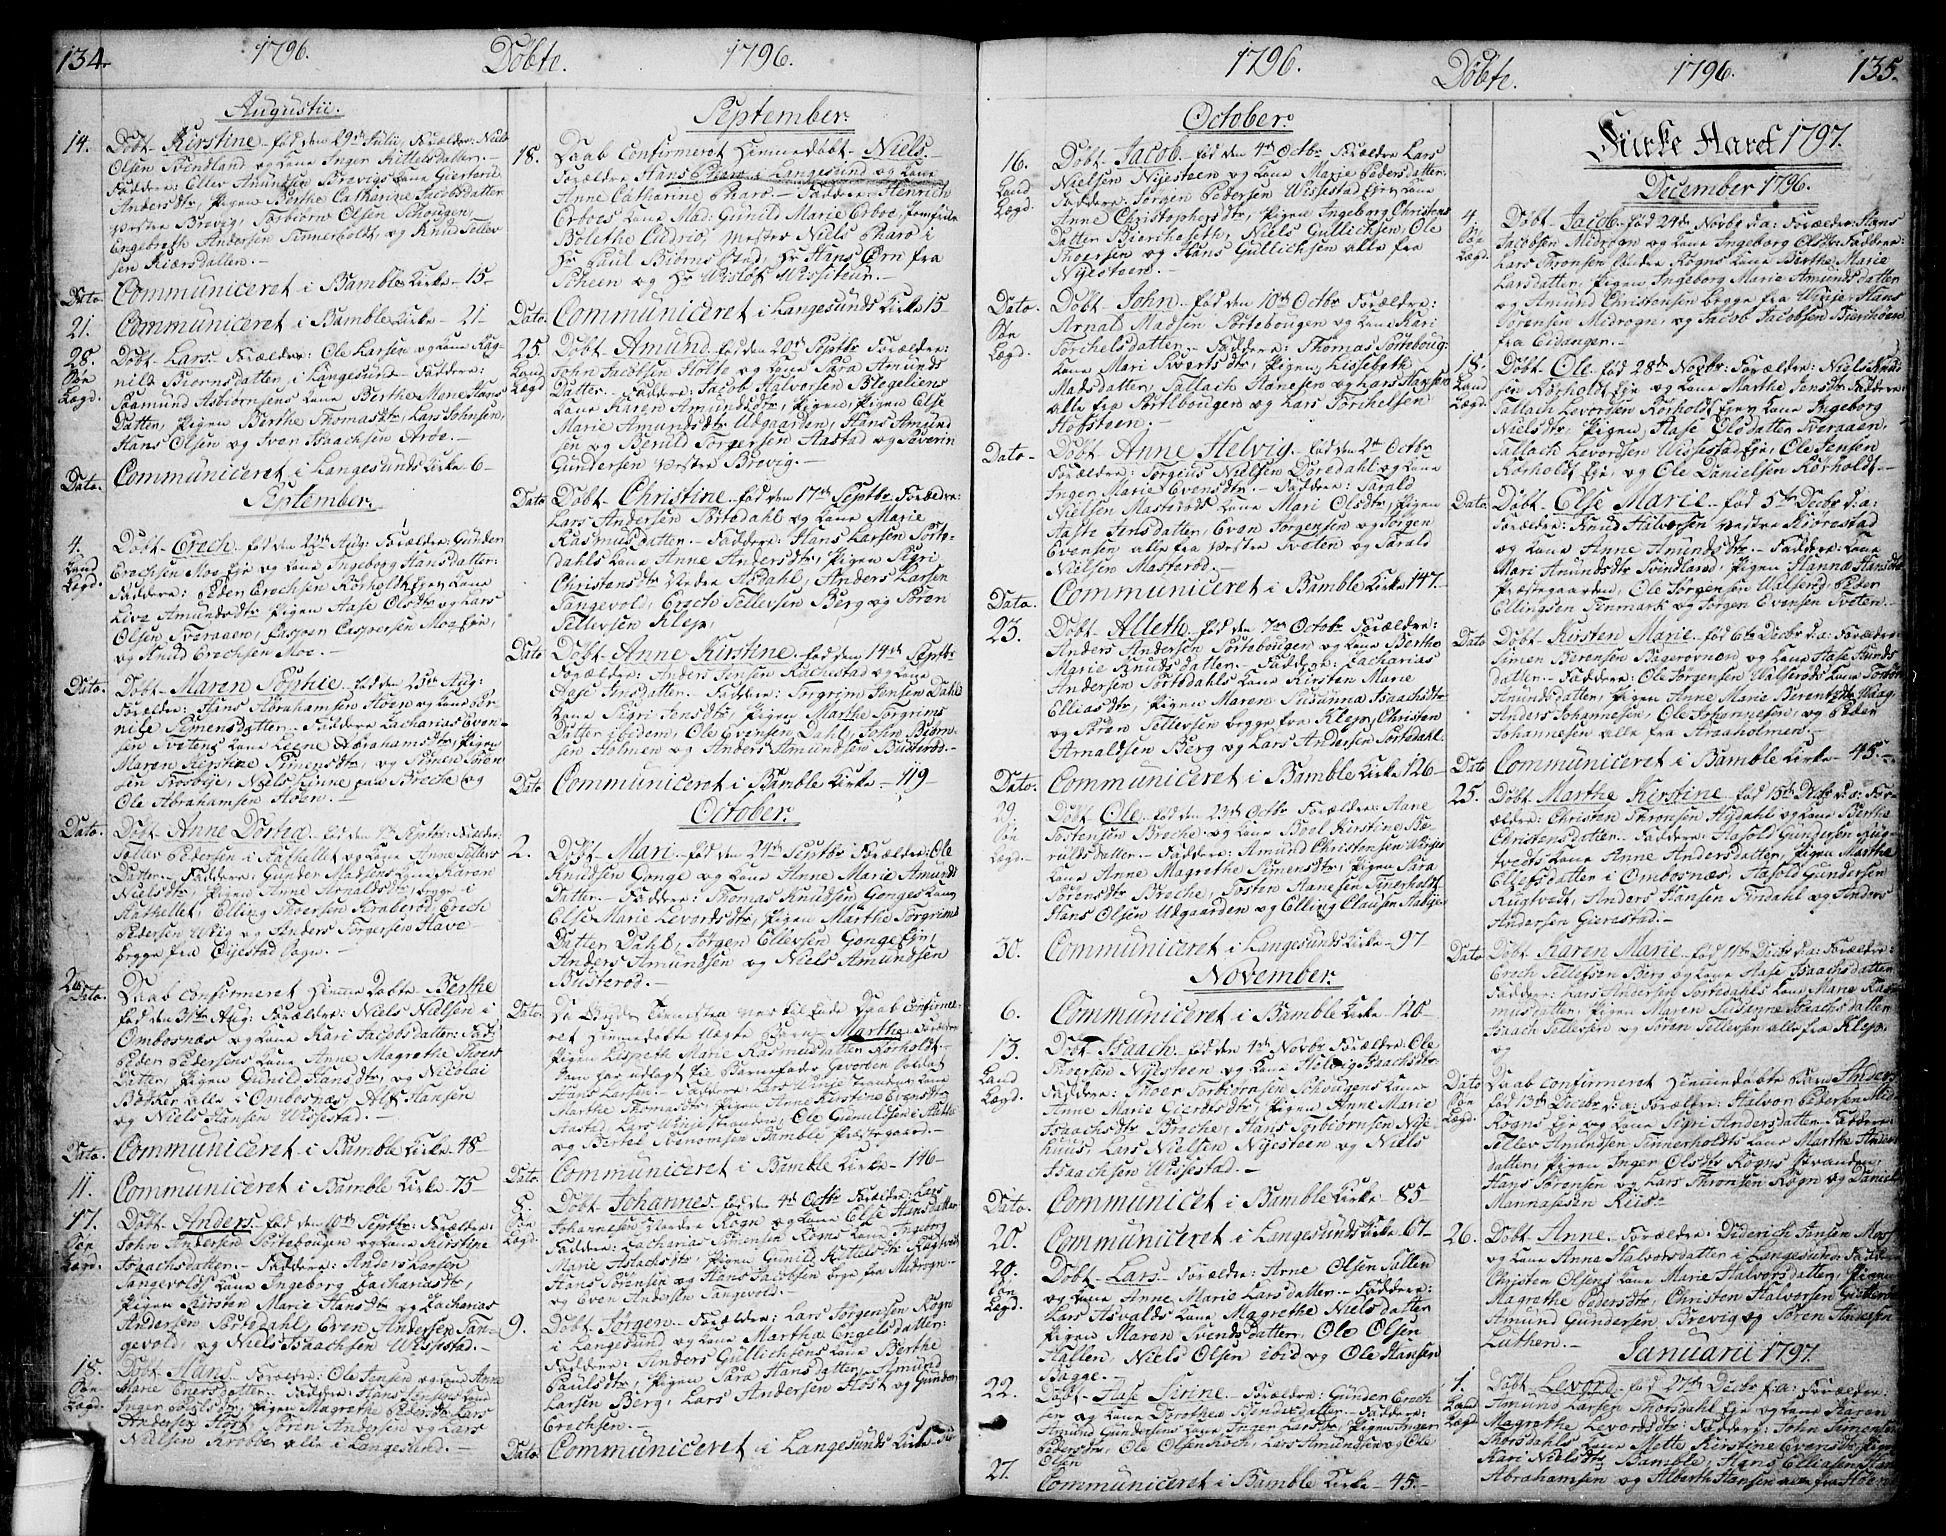 SAKO, Bamble kirkebøker, F/Fa/L0002: Ministerialbok nr. I 2, 1775-1814, s. 134-135